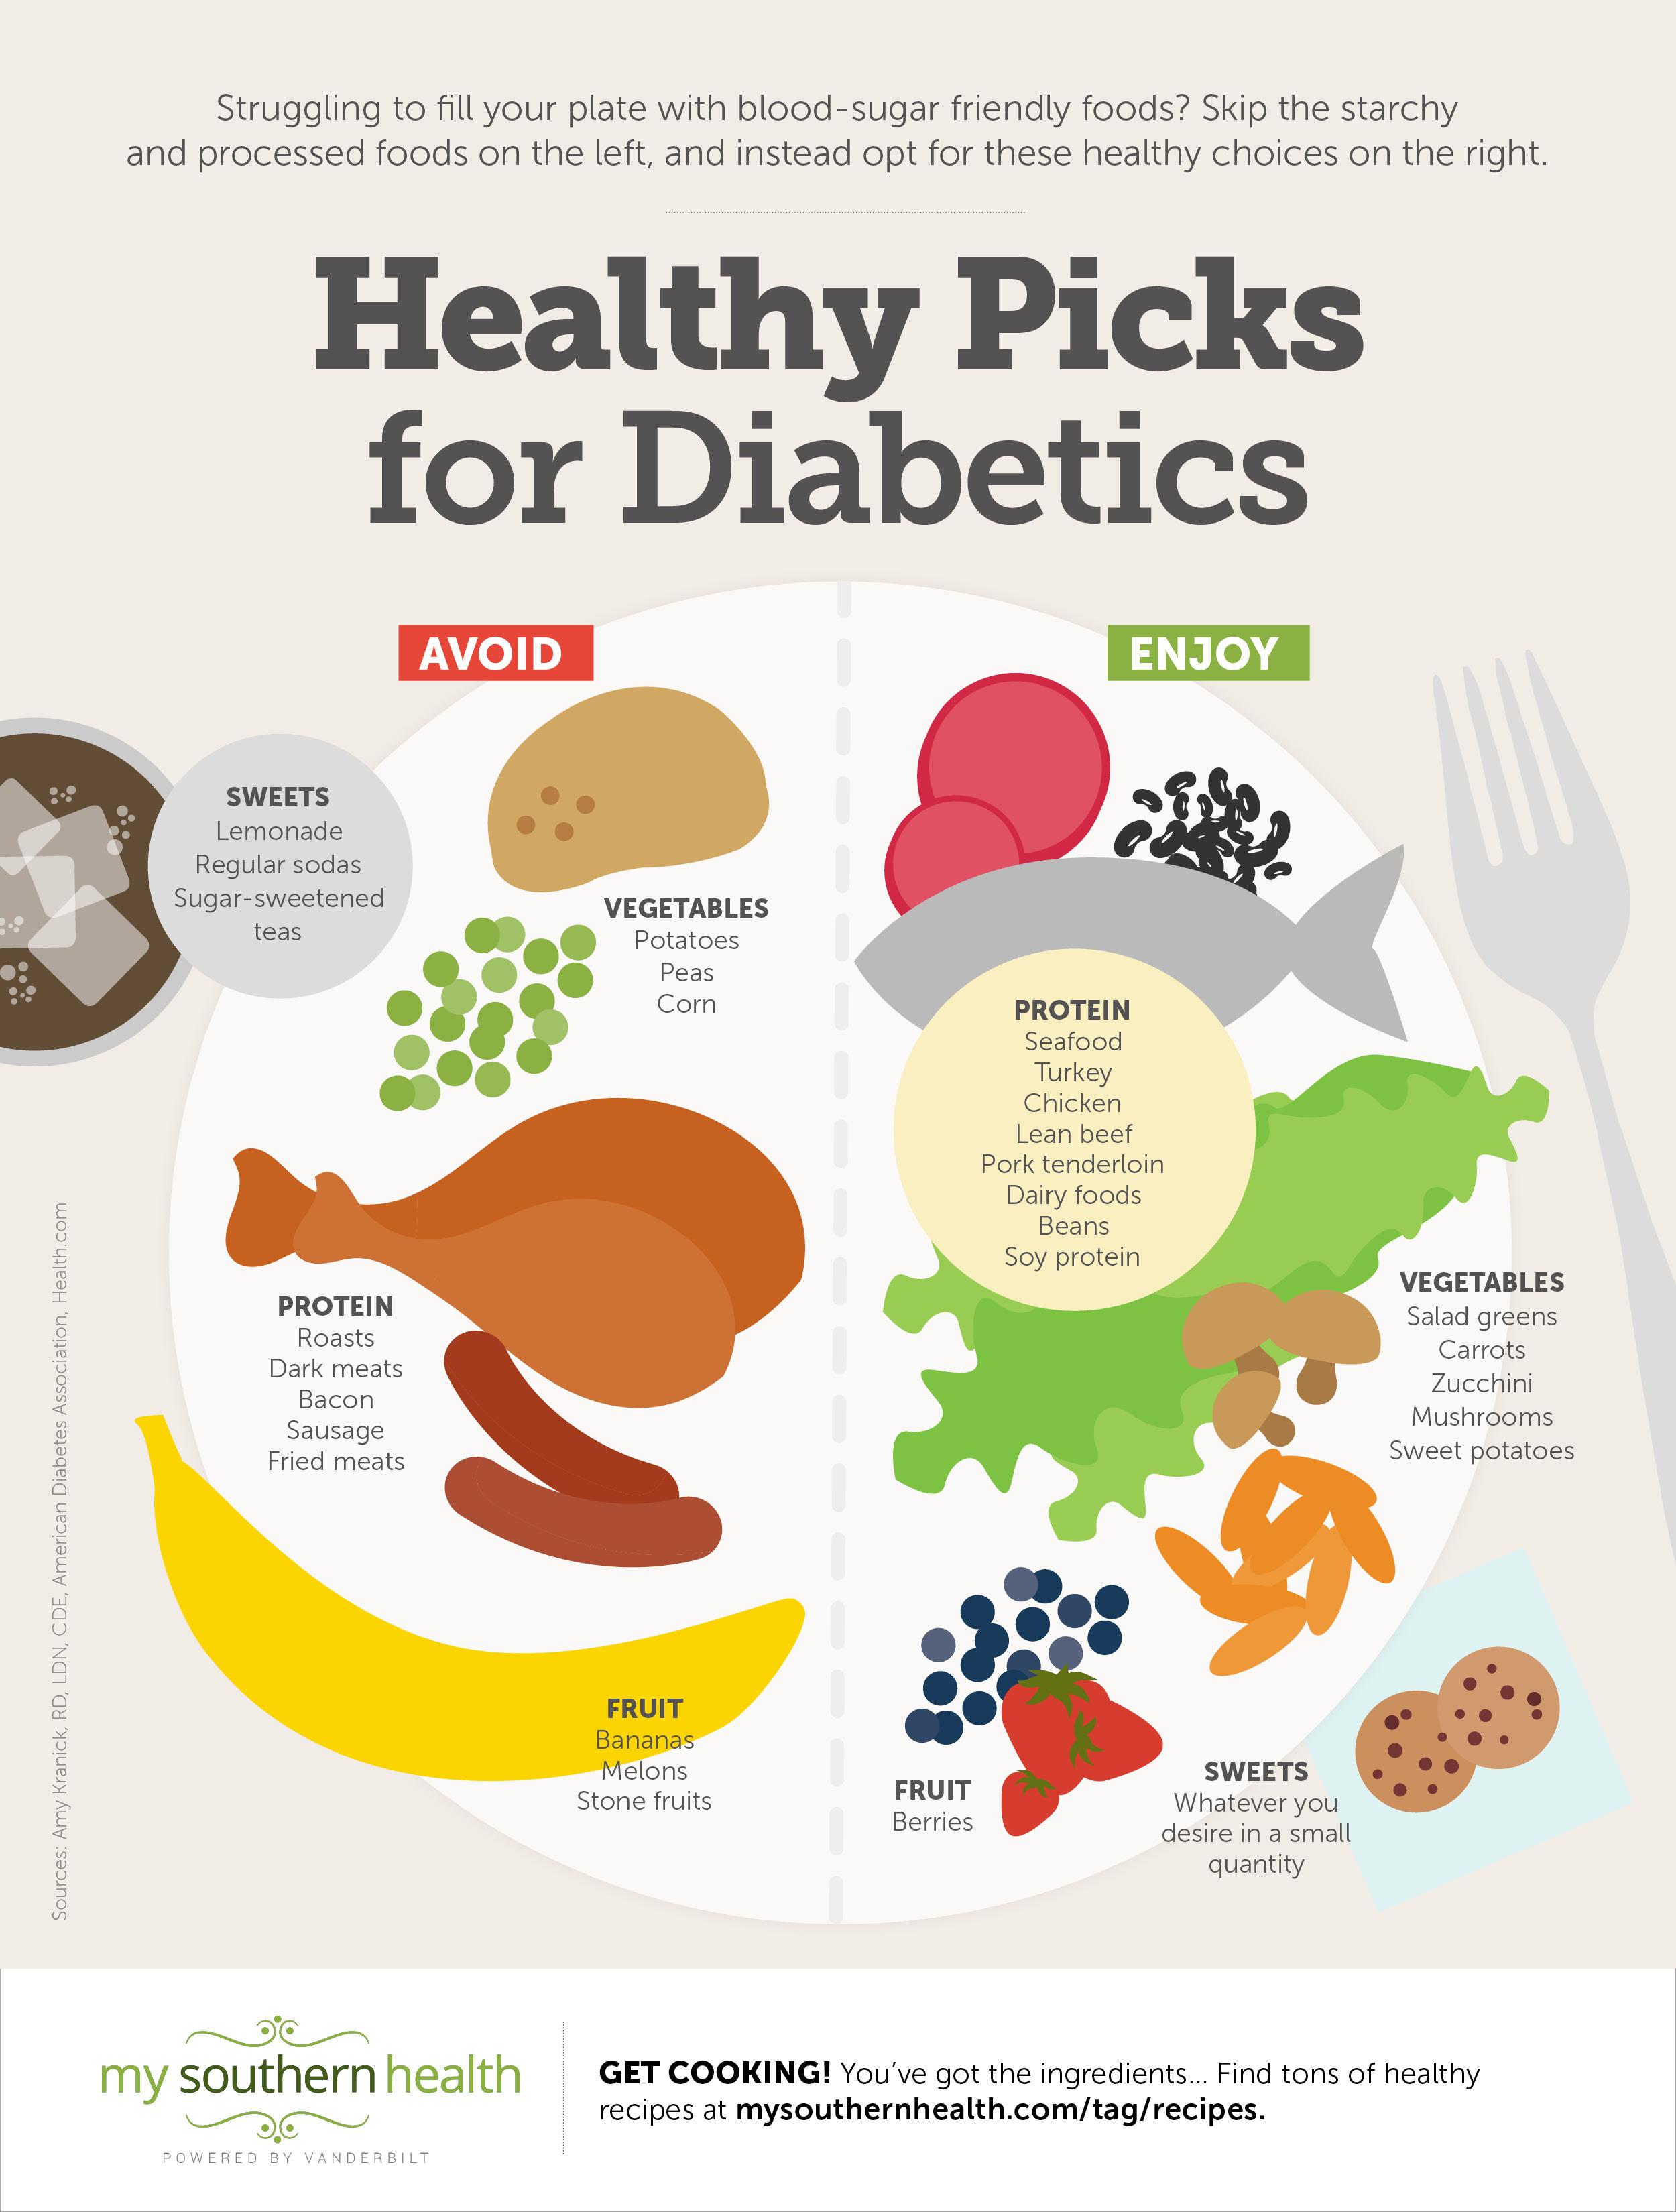 Healthy Snacks For Type 2 Diabetics  Diabetes Diet Healthy Foods for Diabetics [Infographic]